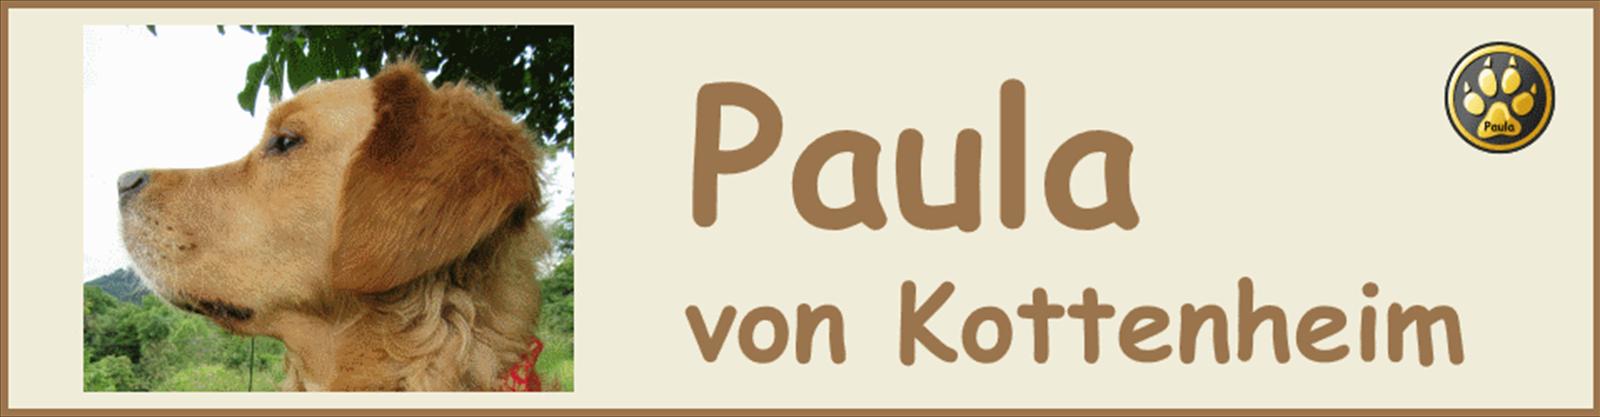 Paula-Banner-09